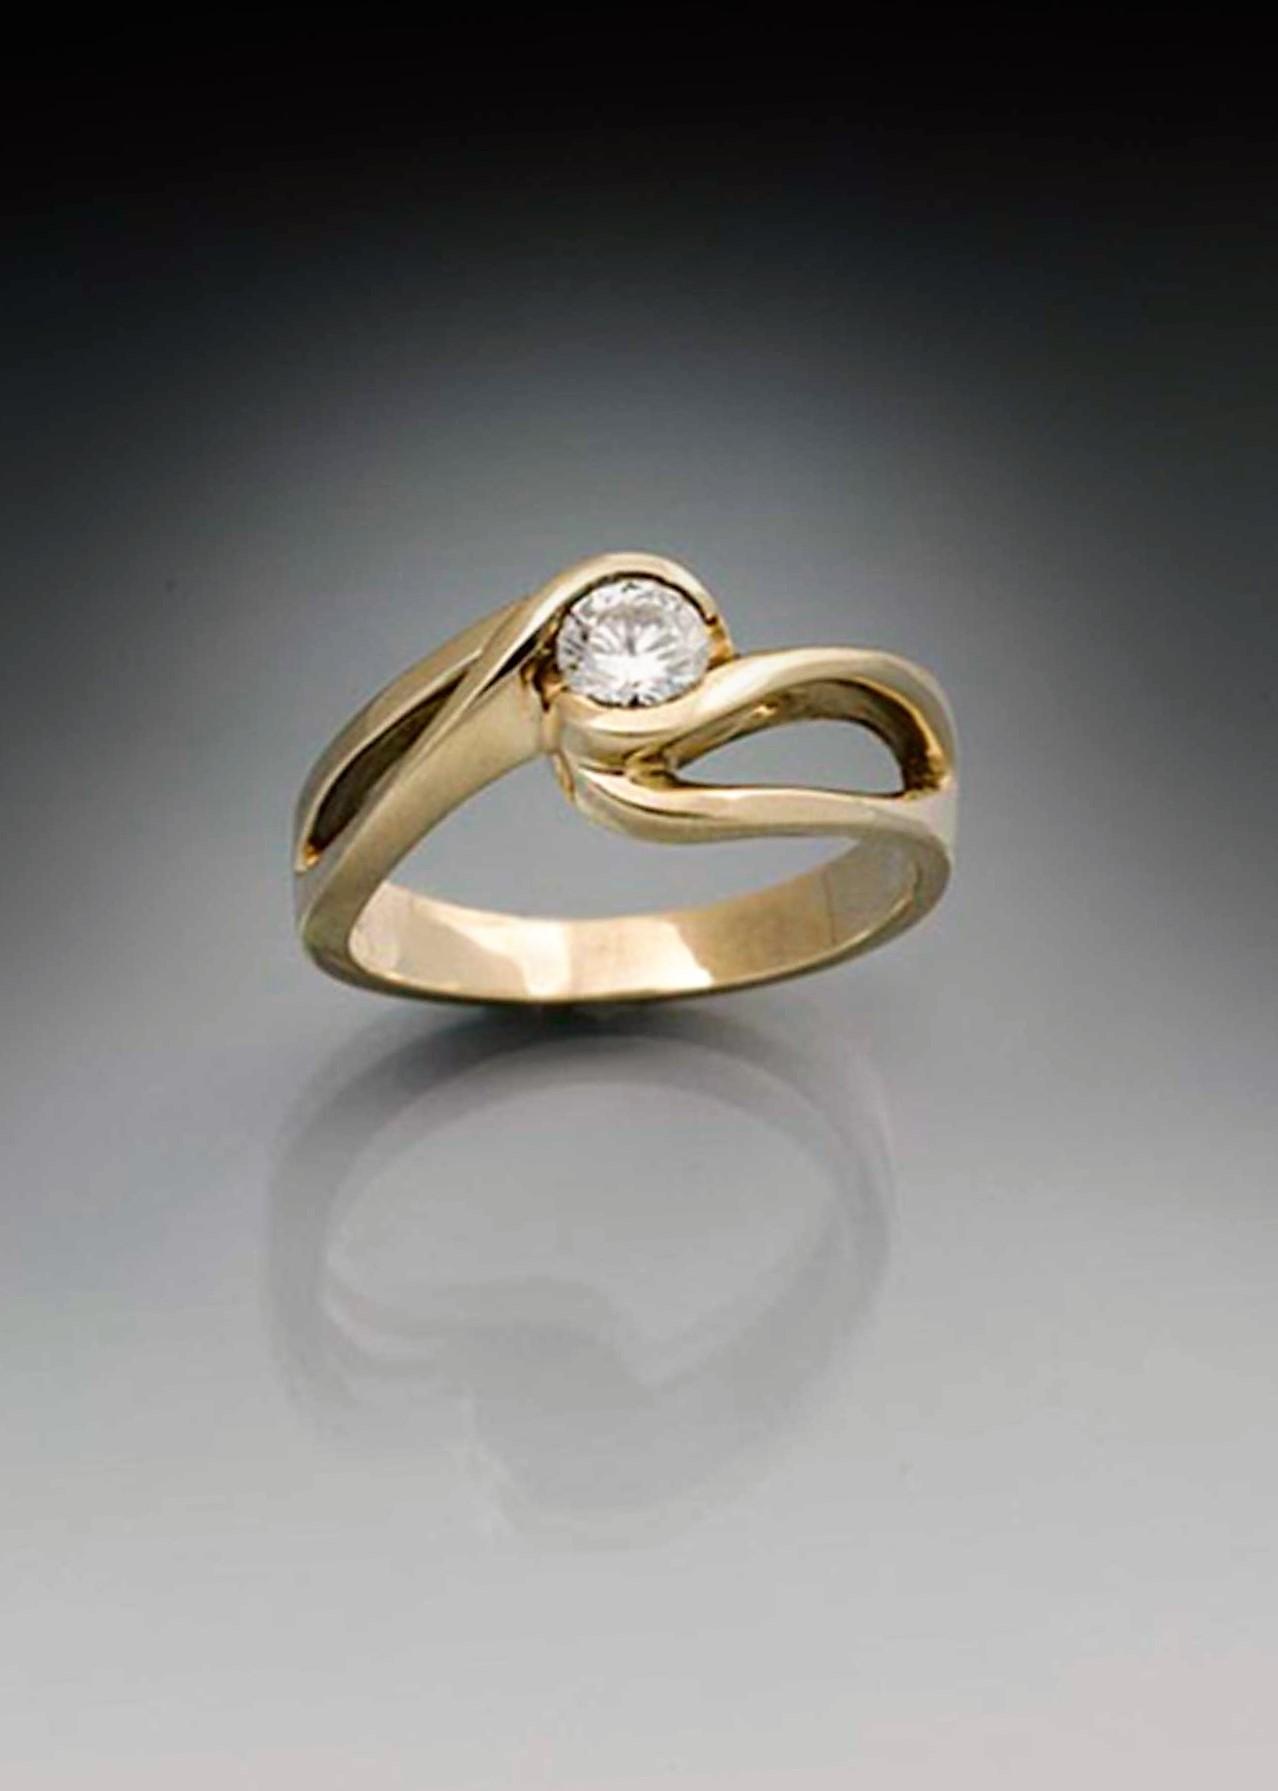 Eternity Swirl Small Diamond Rings Unique